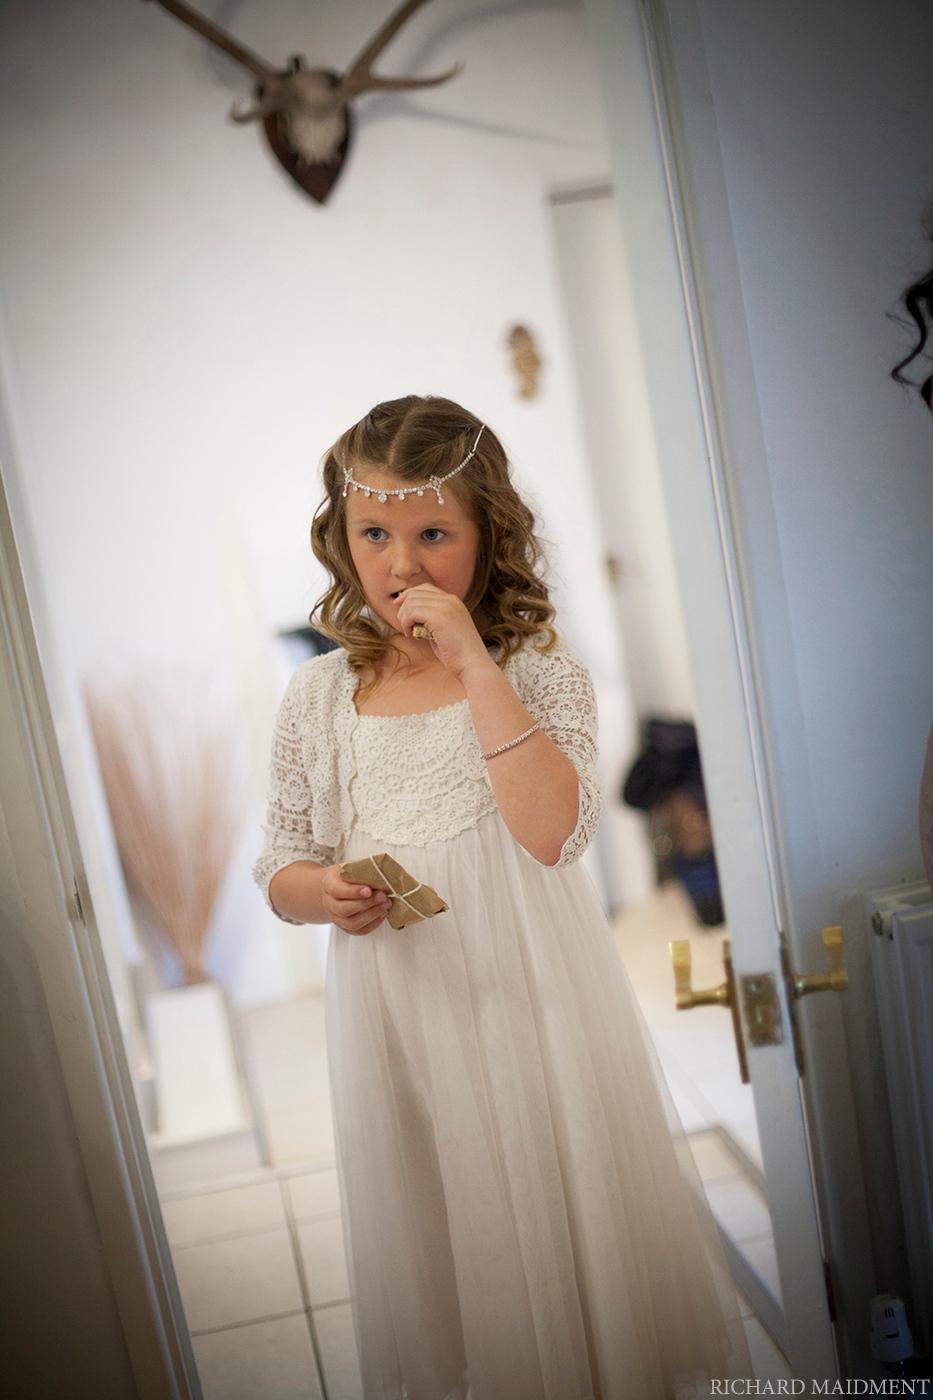 Richard Maidment - Wedding Photography (106).jpg